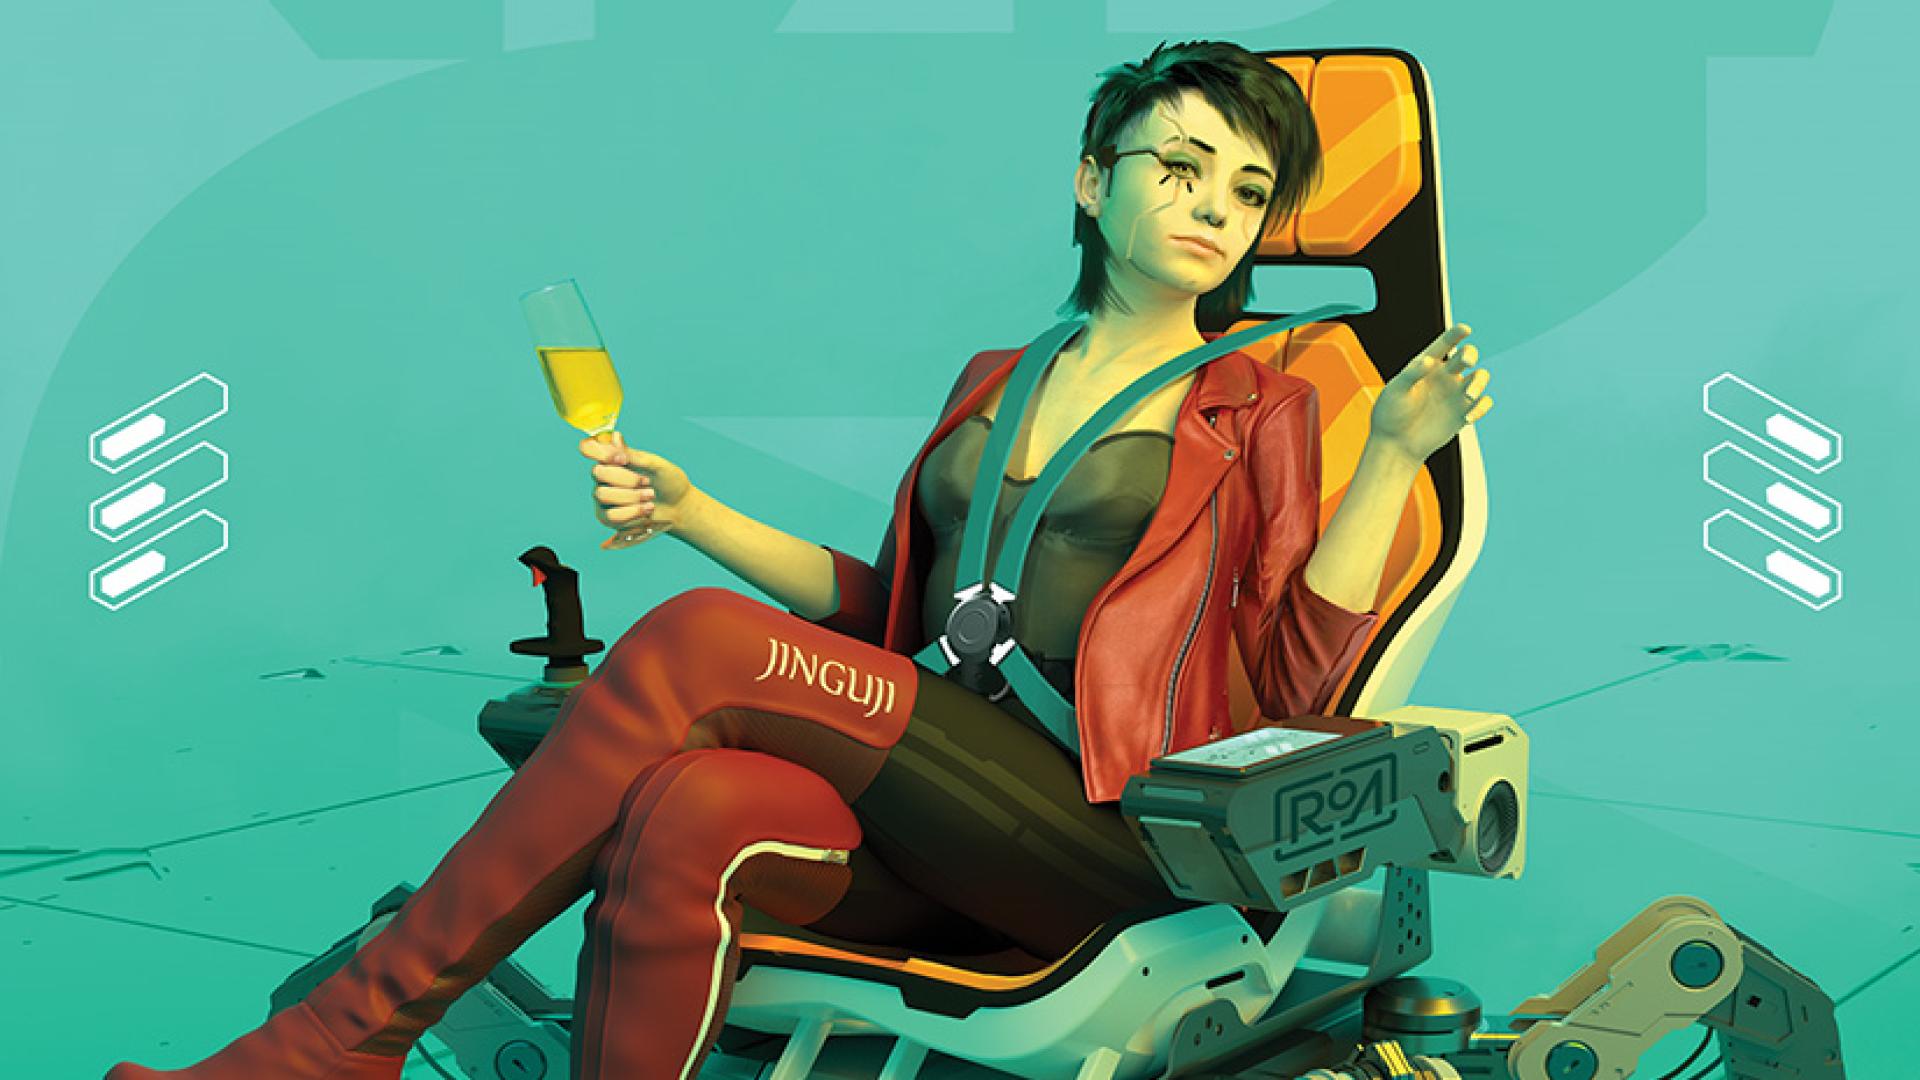 cyberpunk red cyberchair thompson.png